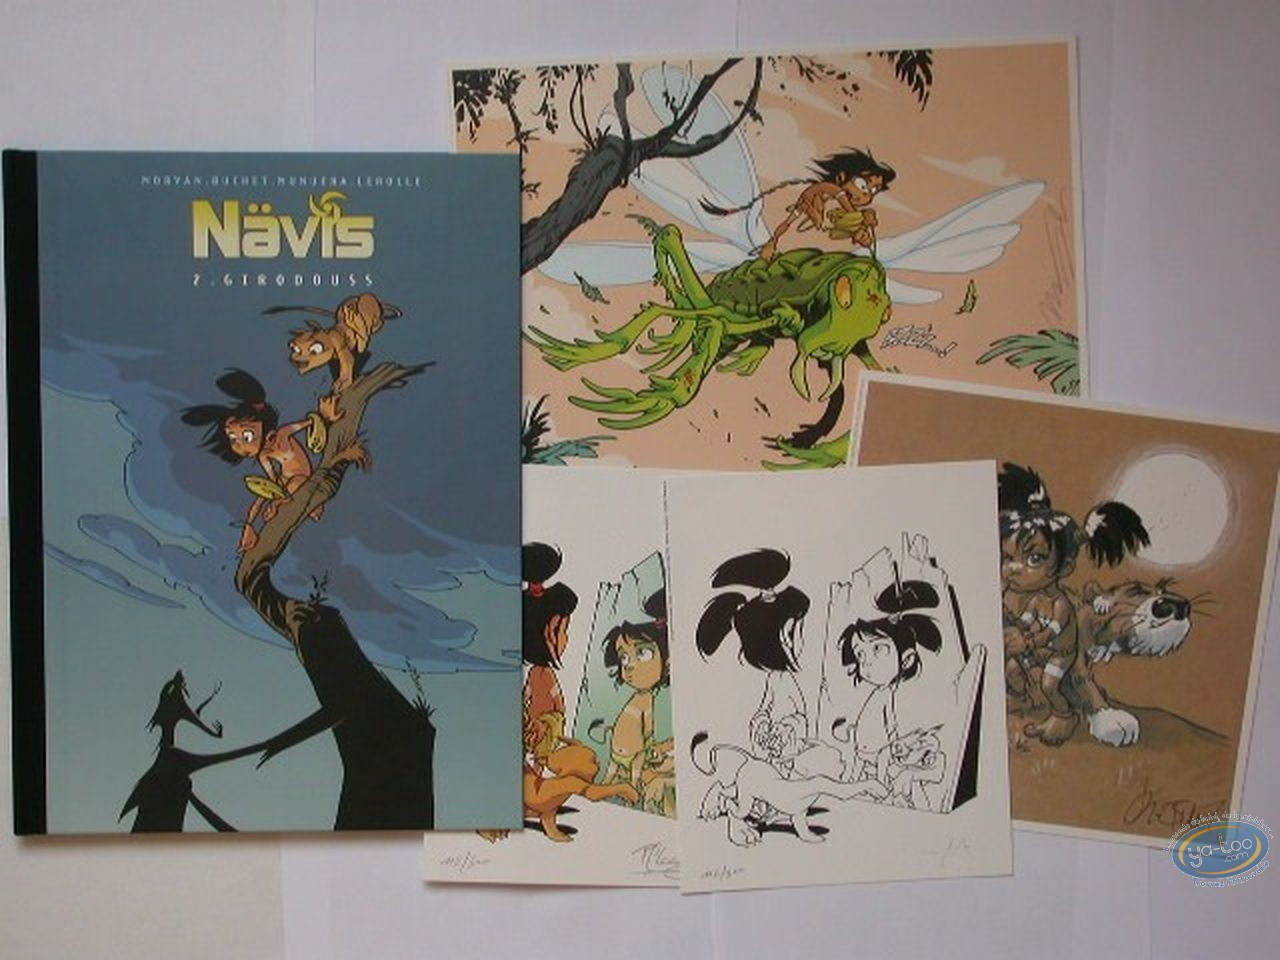 Edition spéciale, Navis : Girodouss